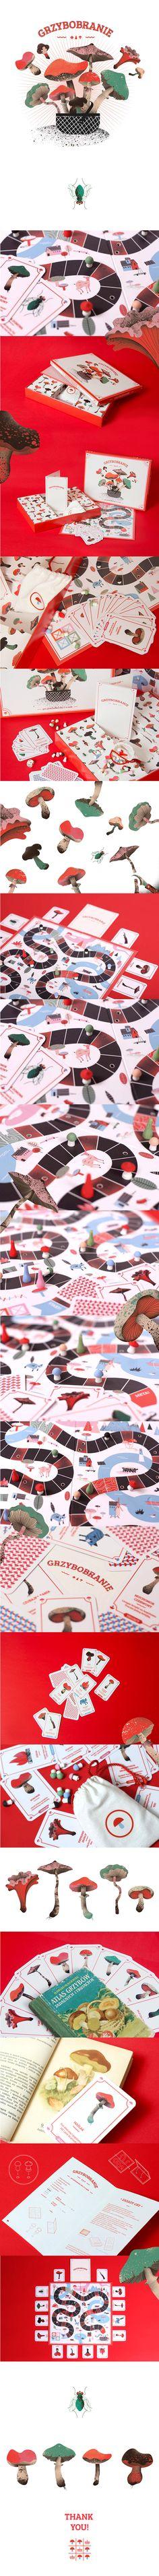 GRZYBOBRANIE - Mushrooming Board Game on Behance